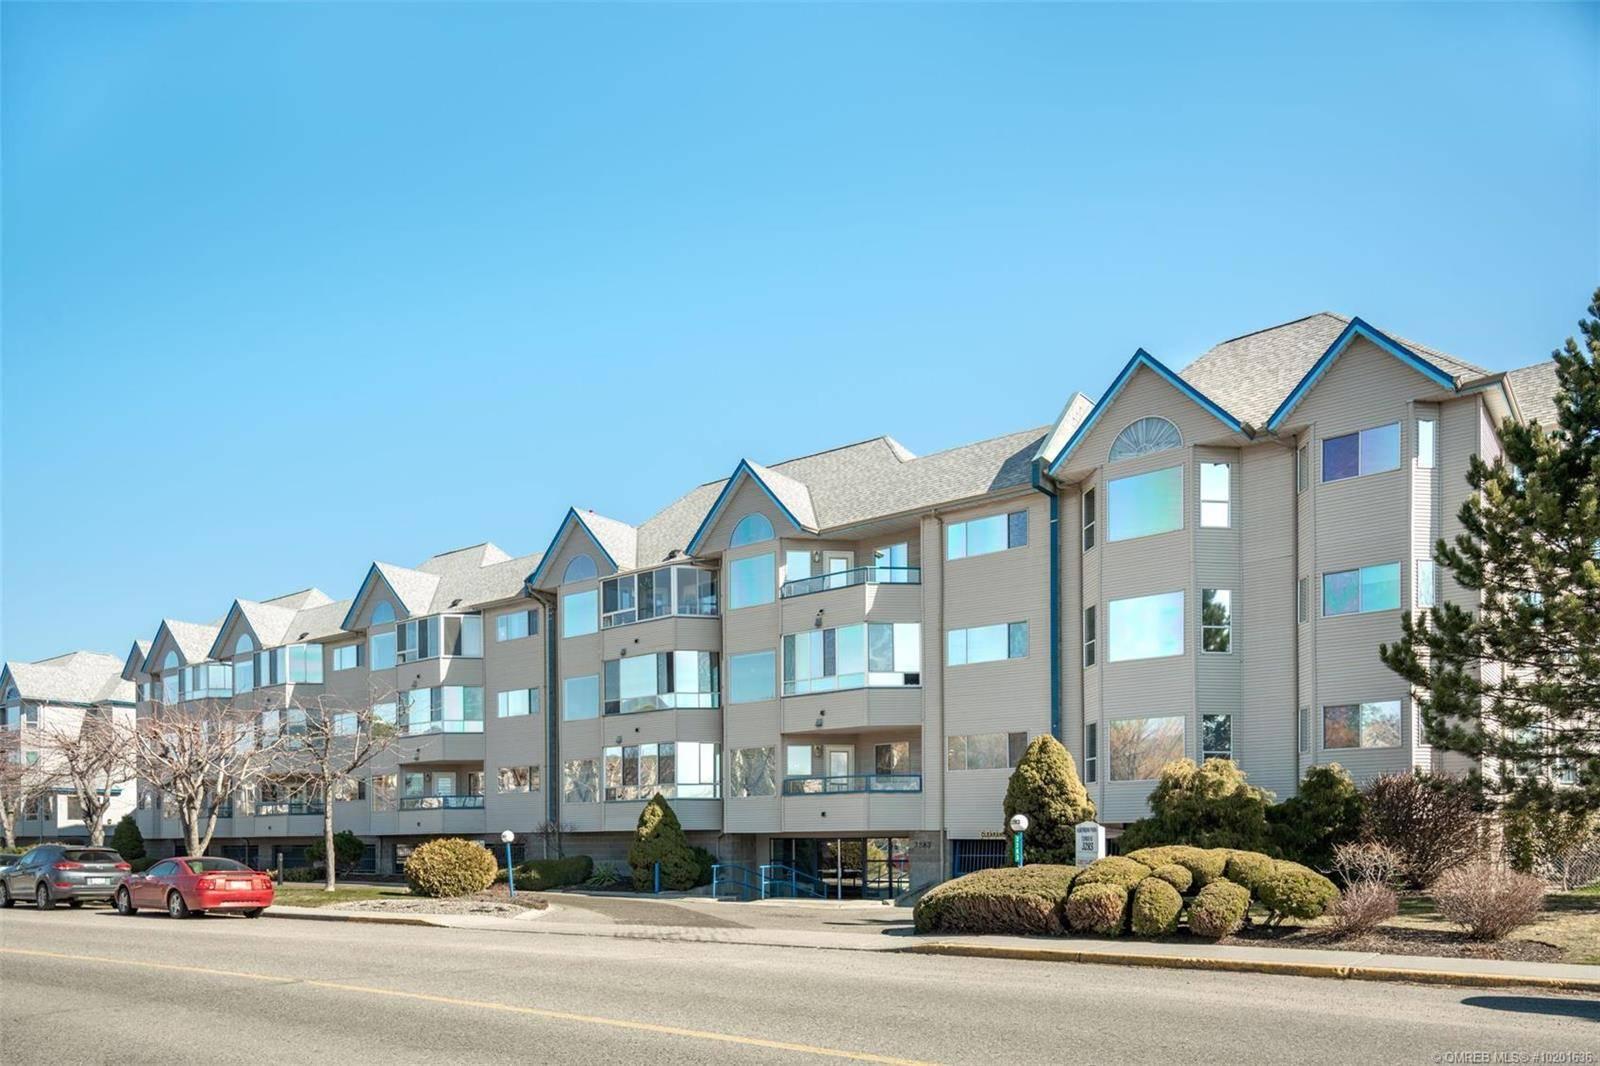 Condo for sale at 3283 Casorso Rd Unit 104 Kelowna British Columbia - MLS: 10201636